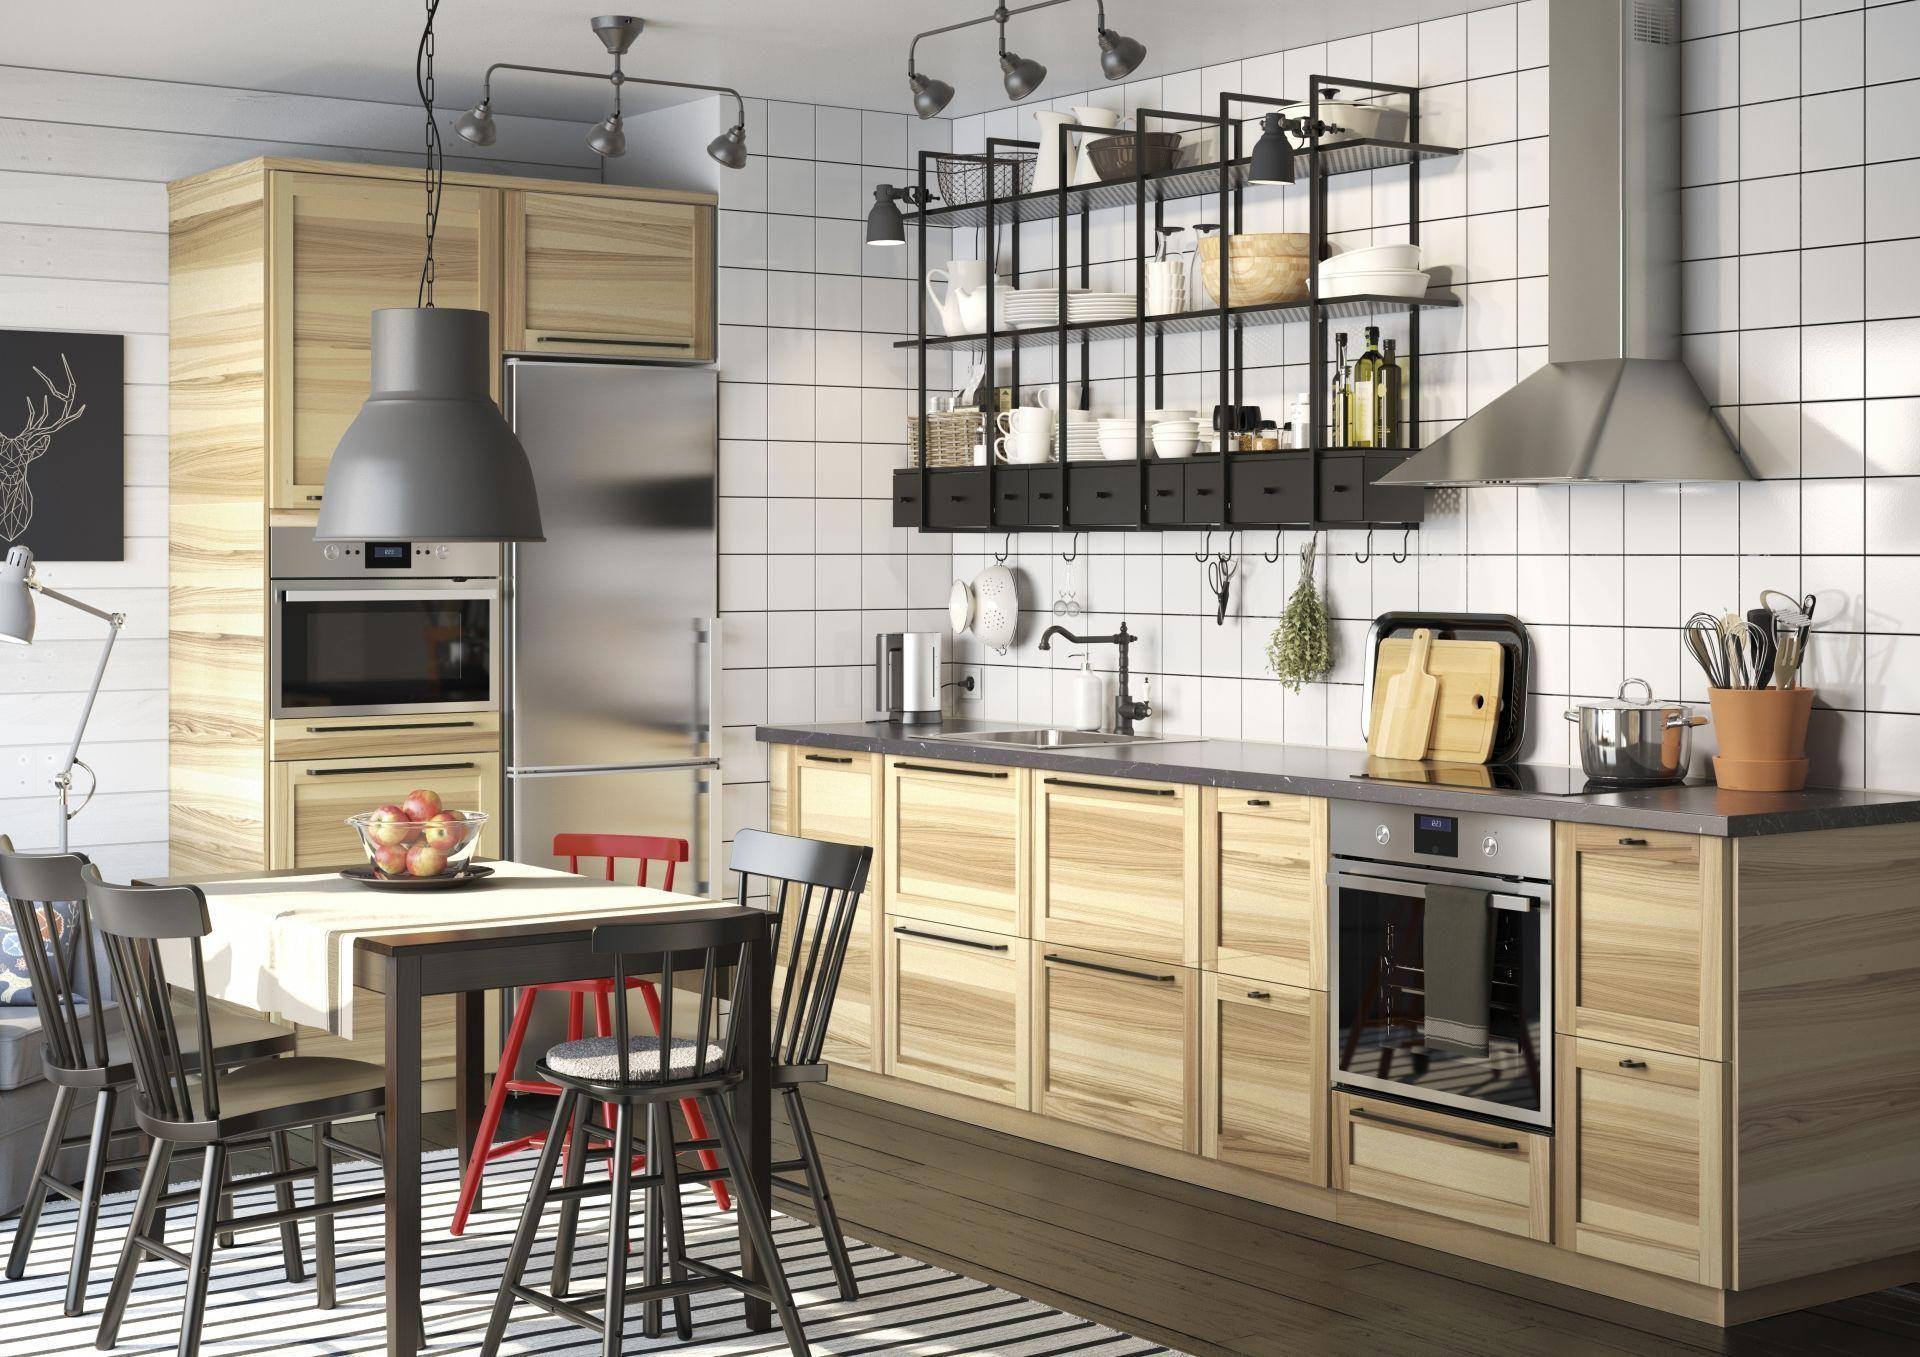 Beste TORHAMN plint | IKEA IKEAnl IKEAnederland inspiratie MO-27